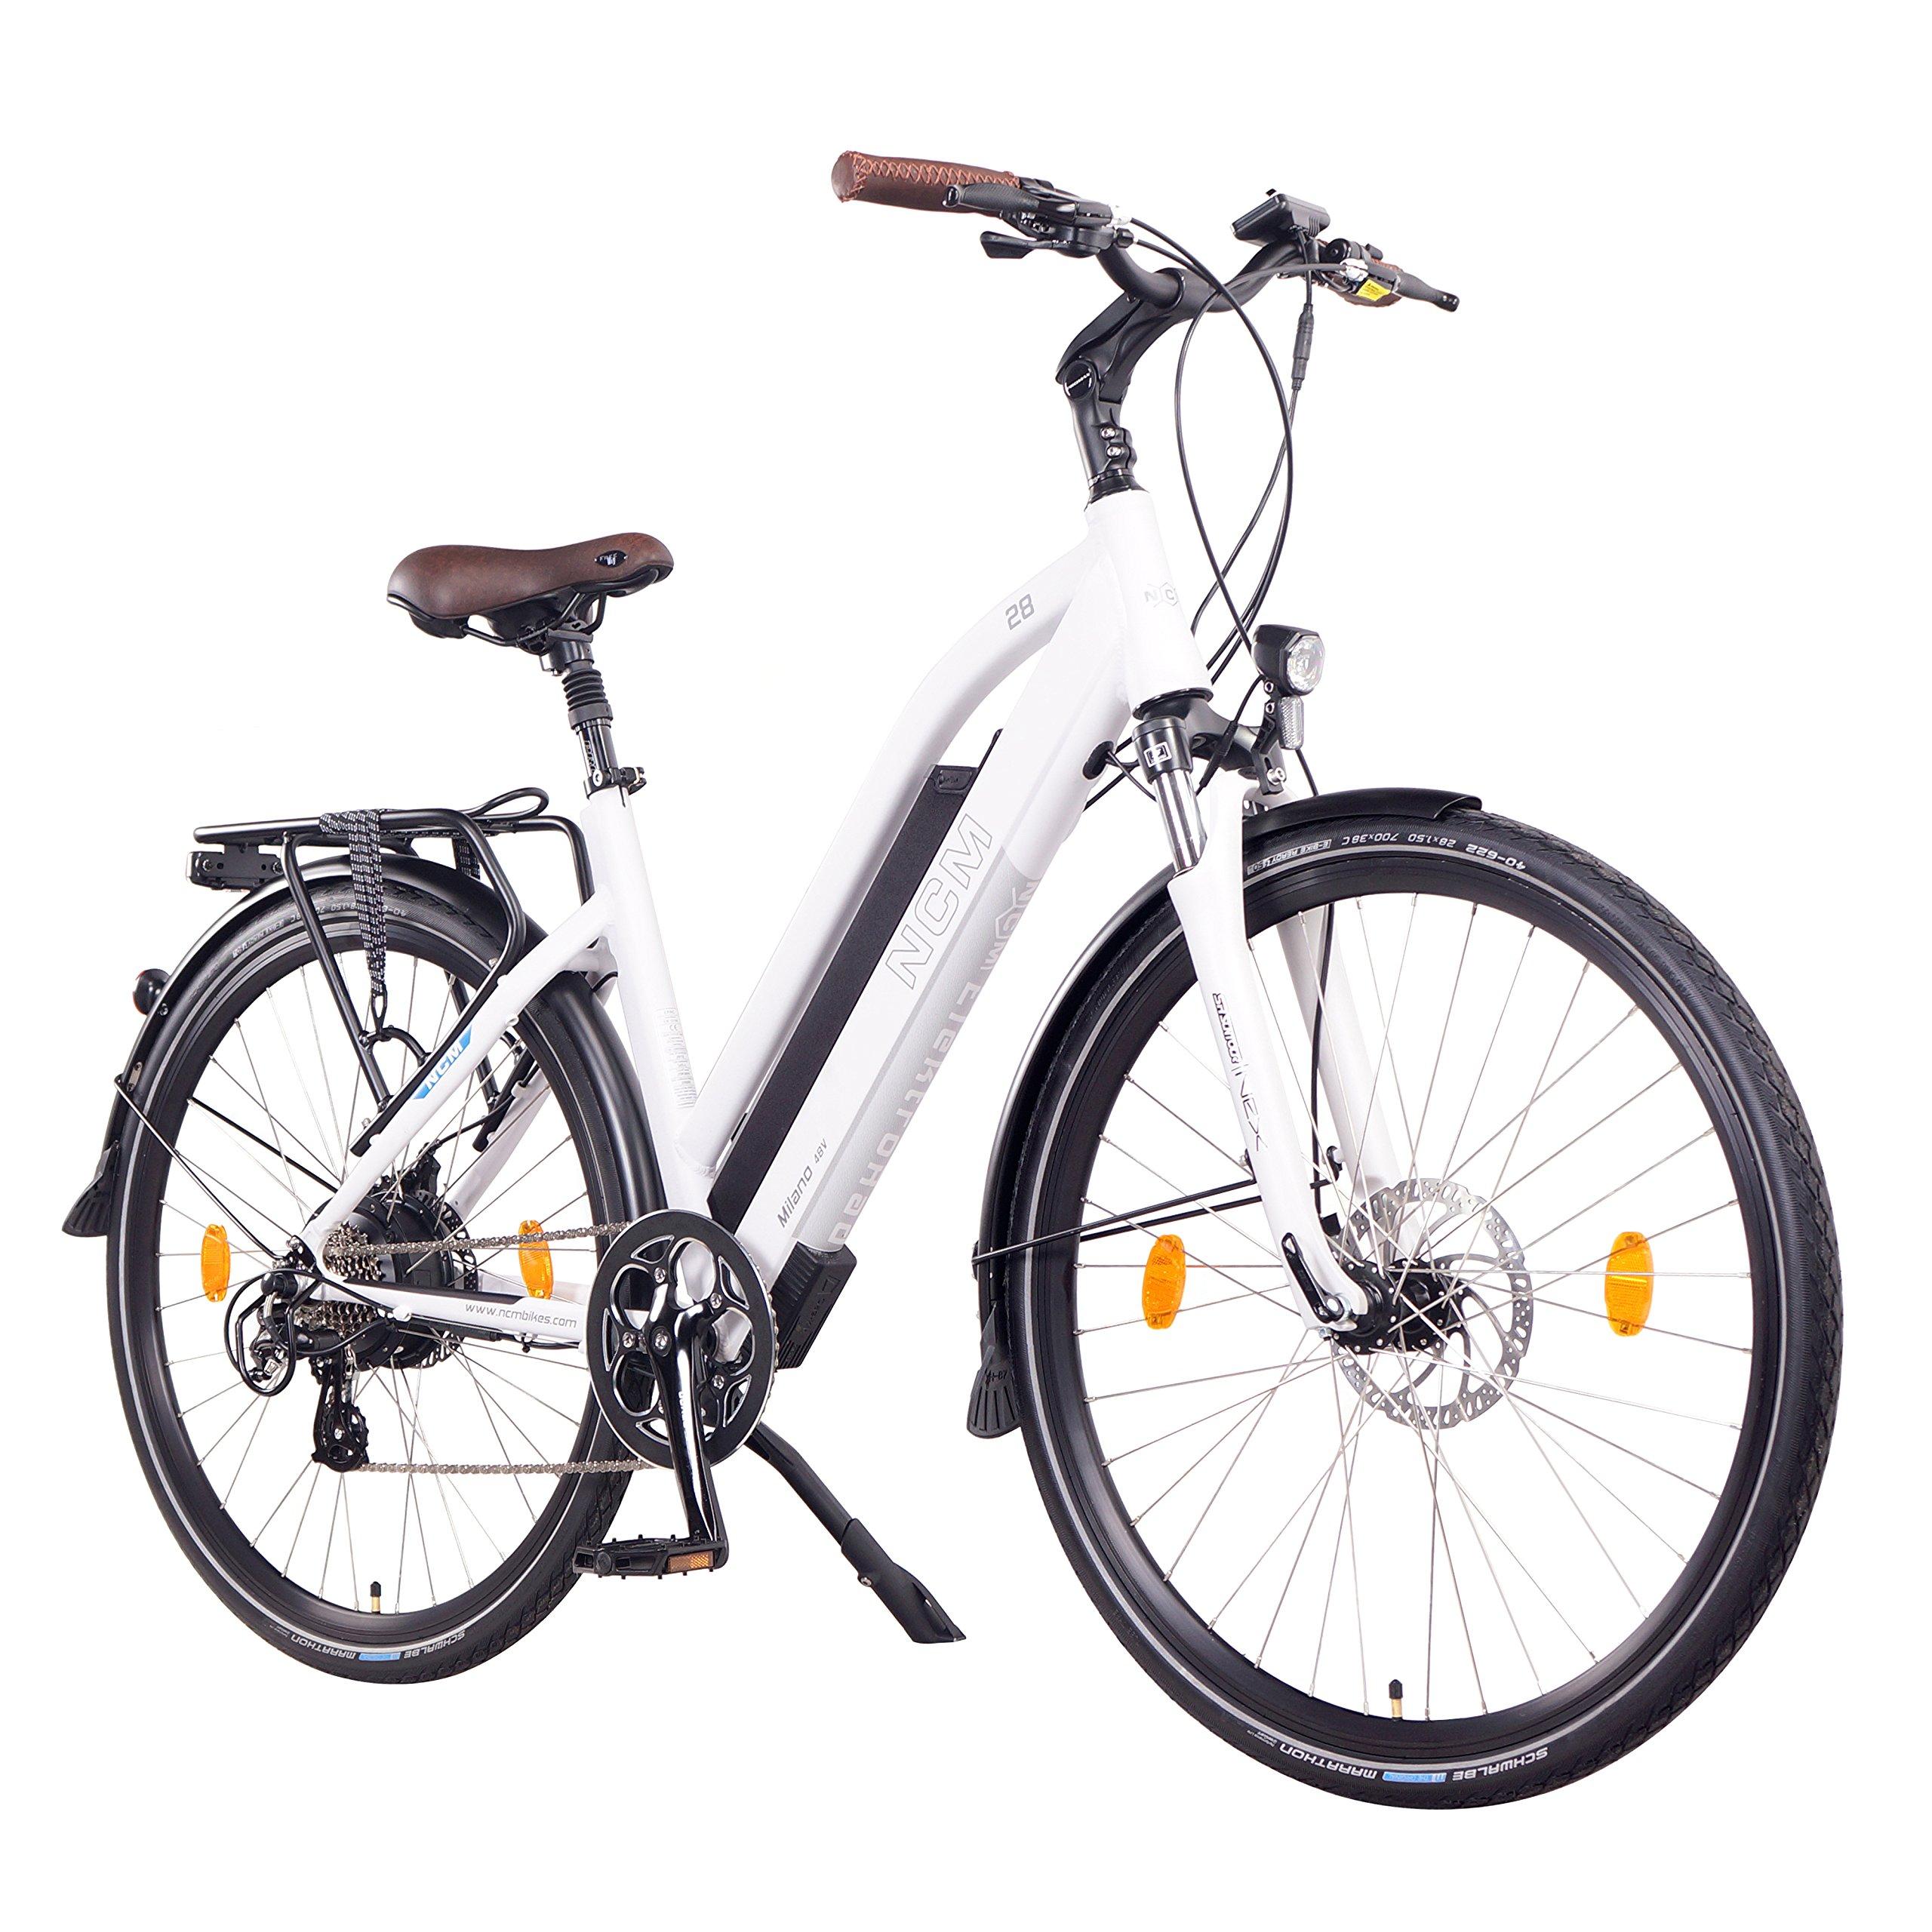 I Piu Votati Nella Categoria Bici Elettriche Recensioni Clienti